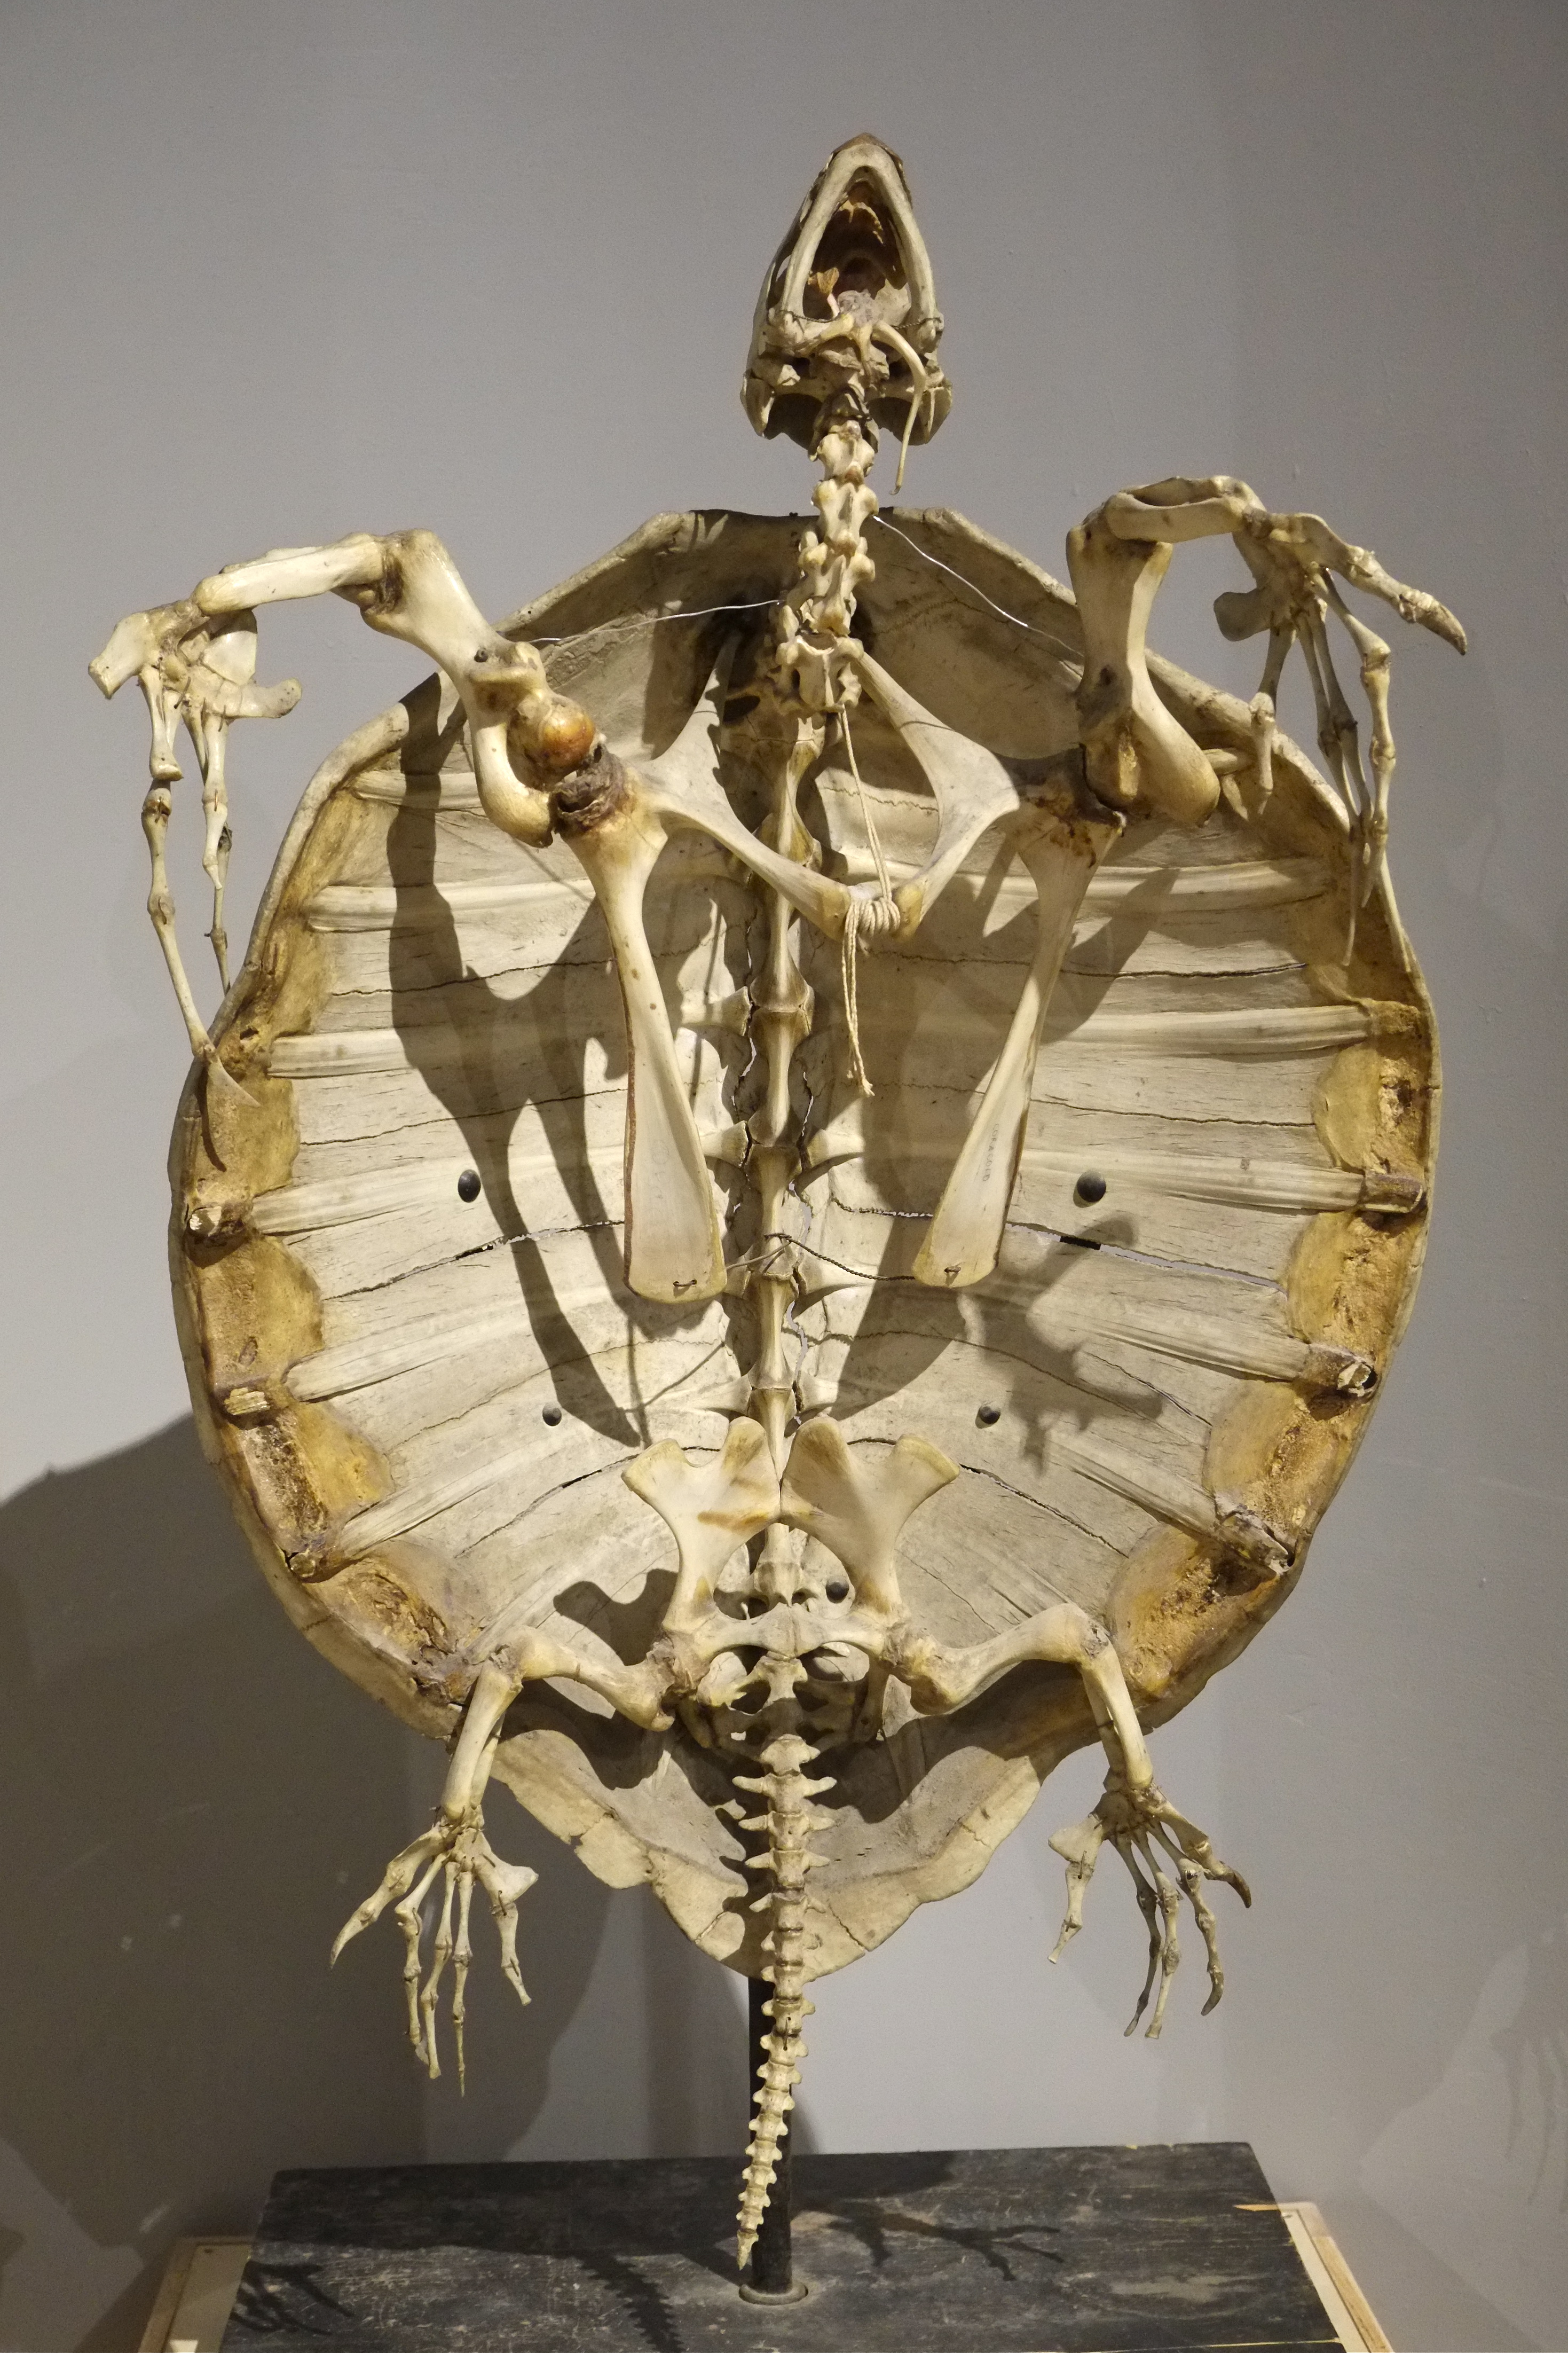 Olive Ridley skeleton ©Kim Smith 2014